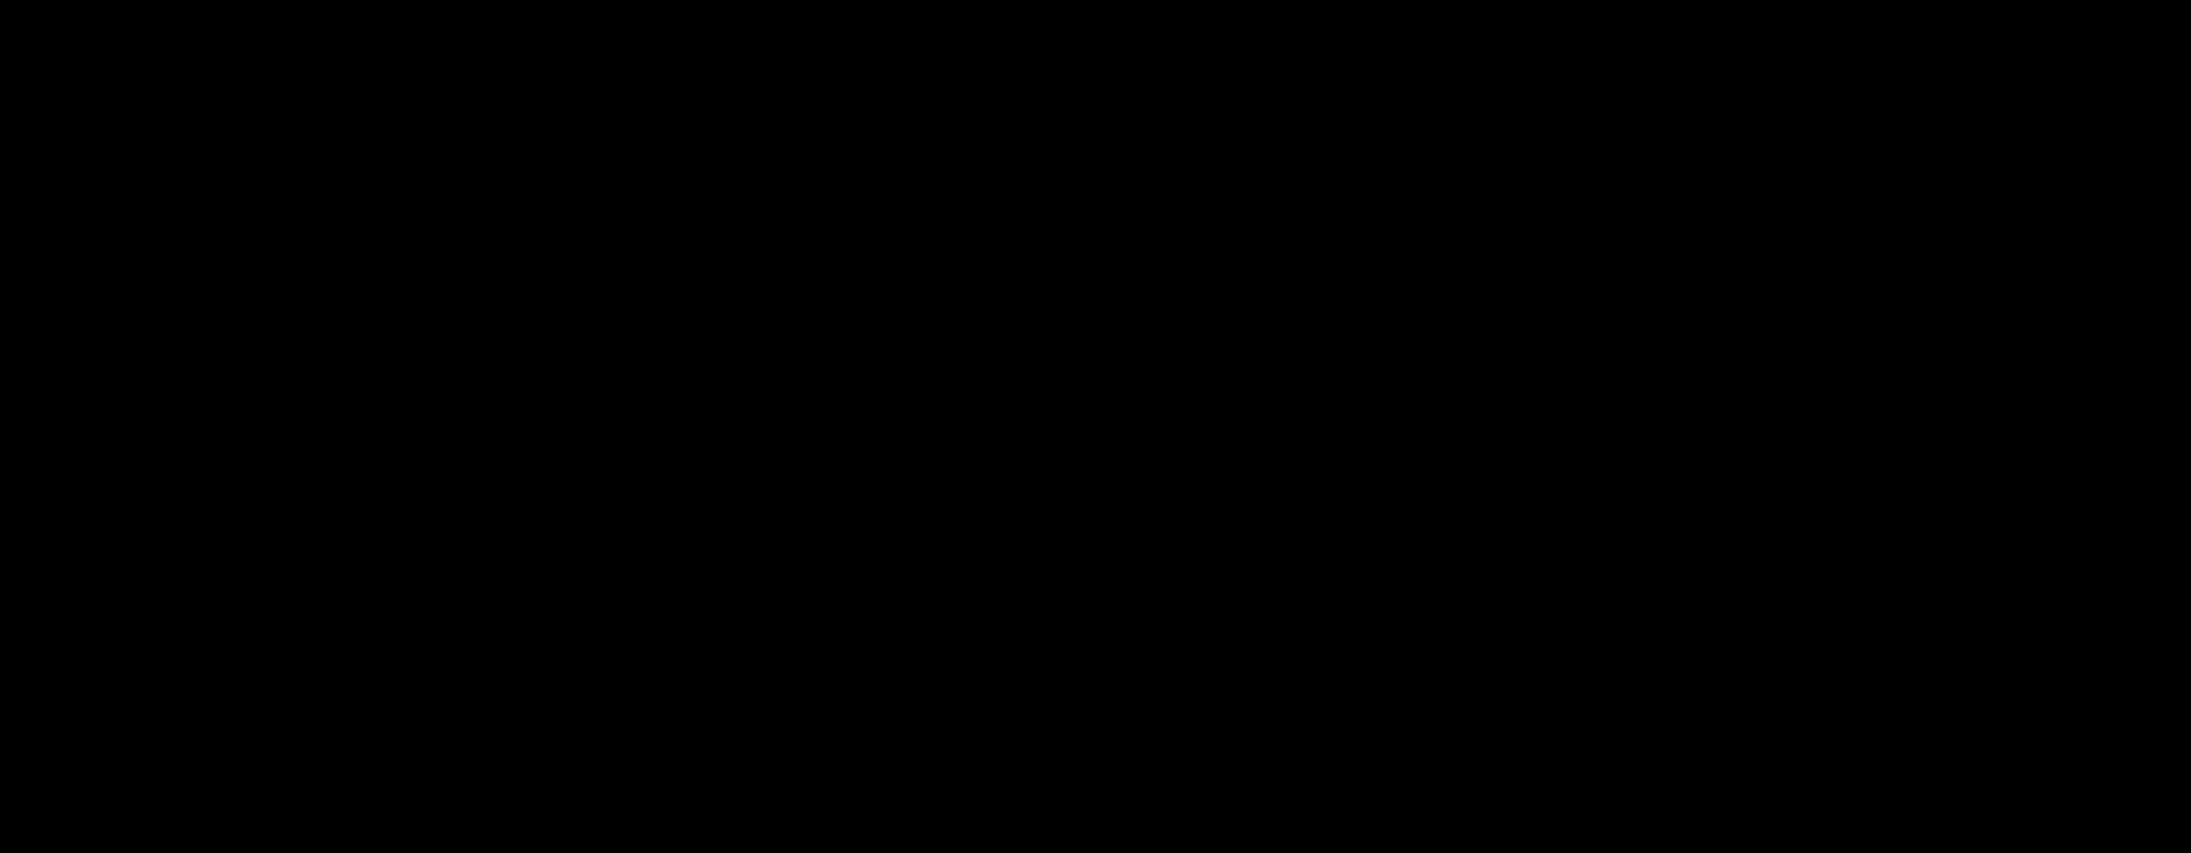 Download Hd European Audiovisual Observatory Logo Png Transparent